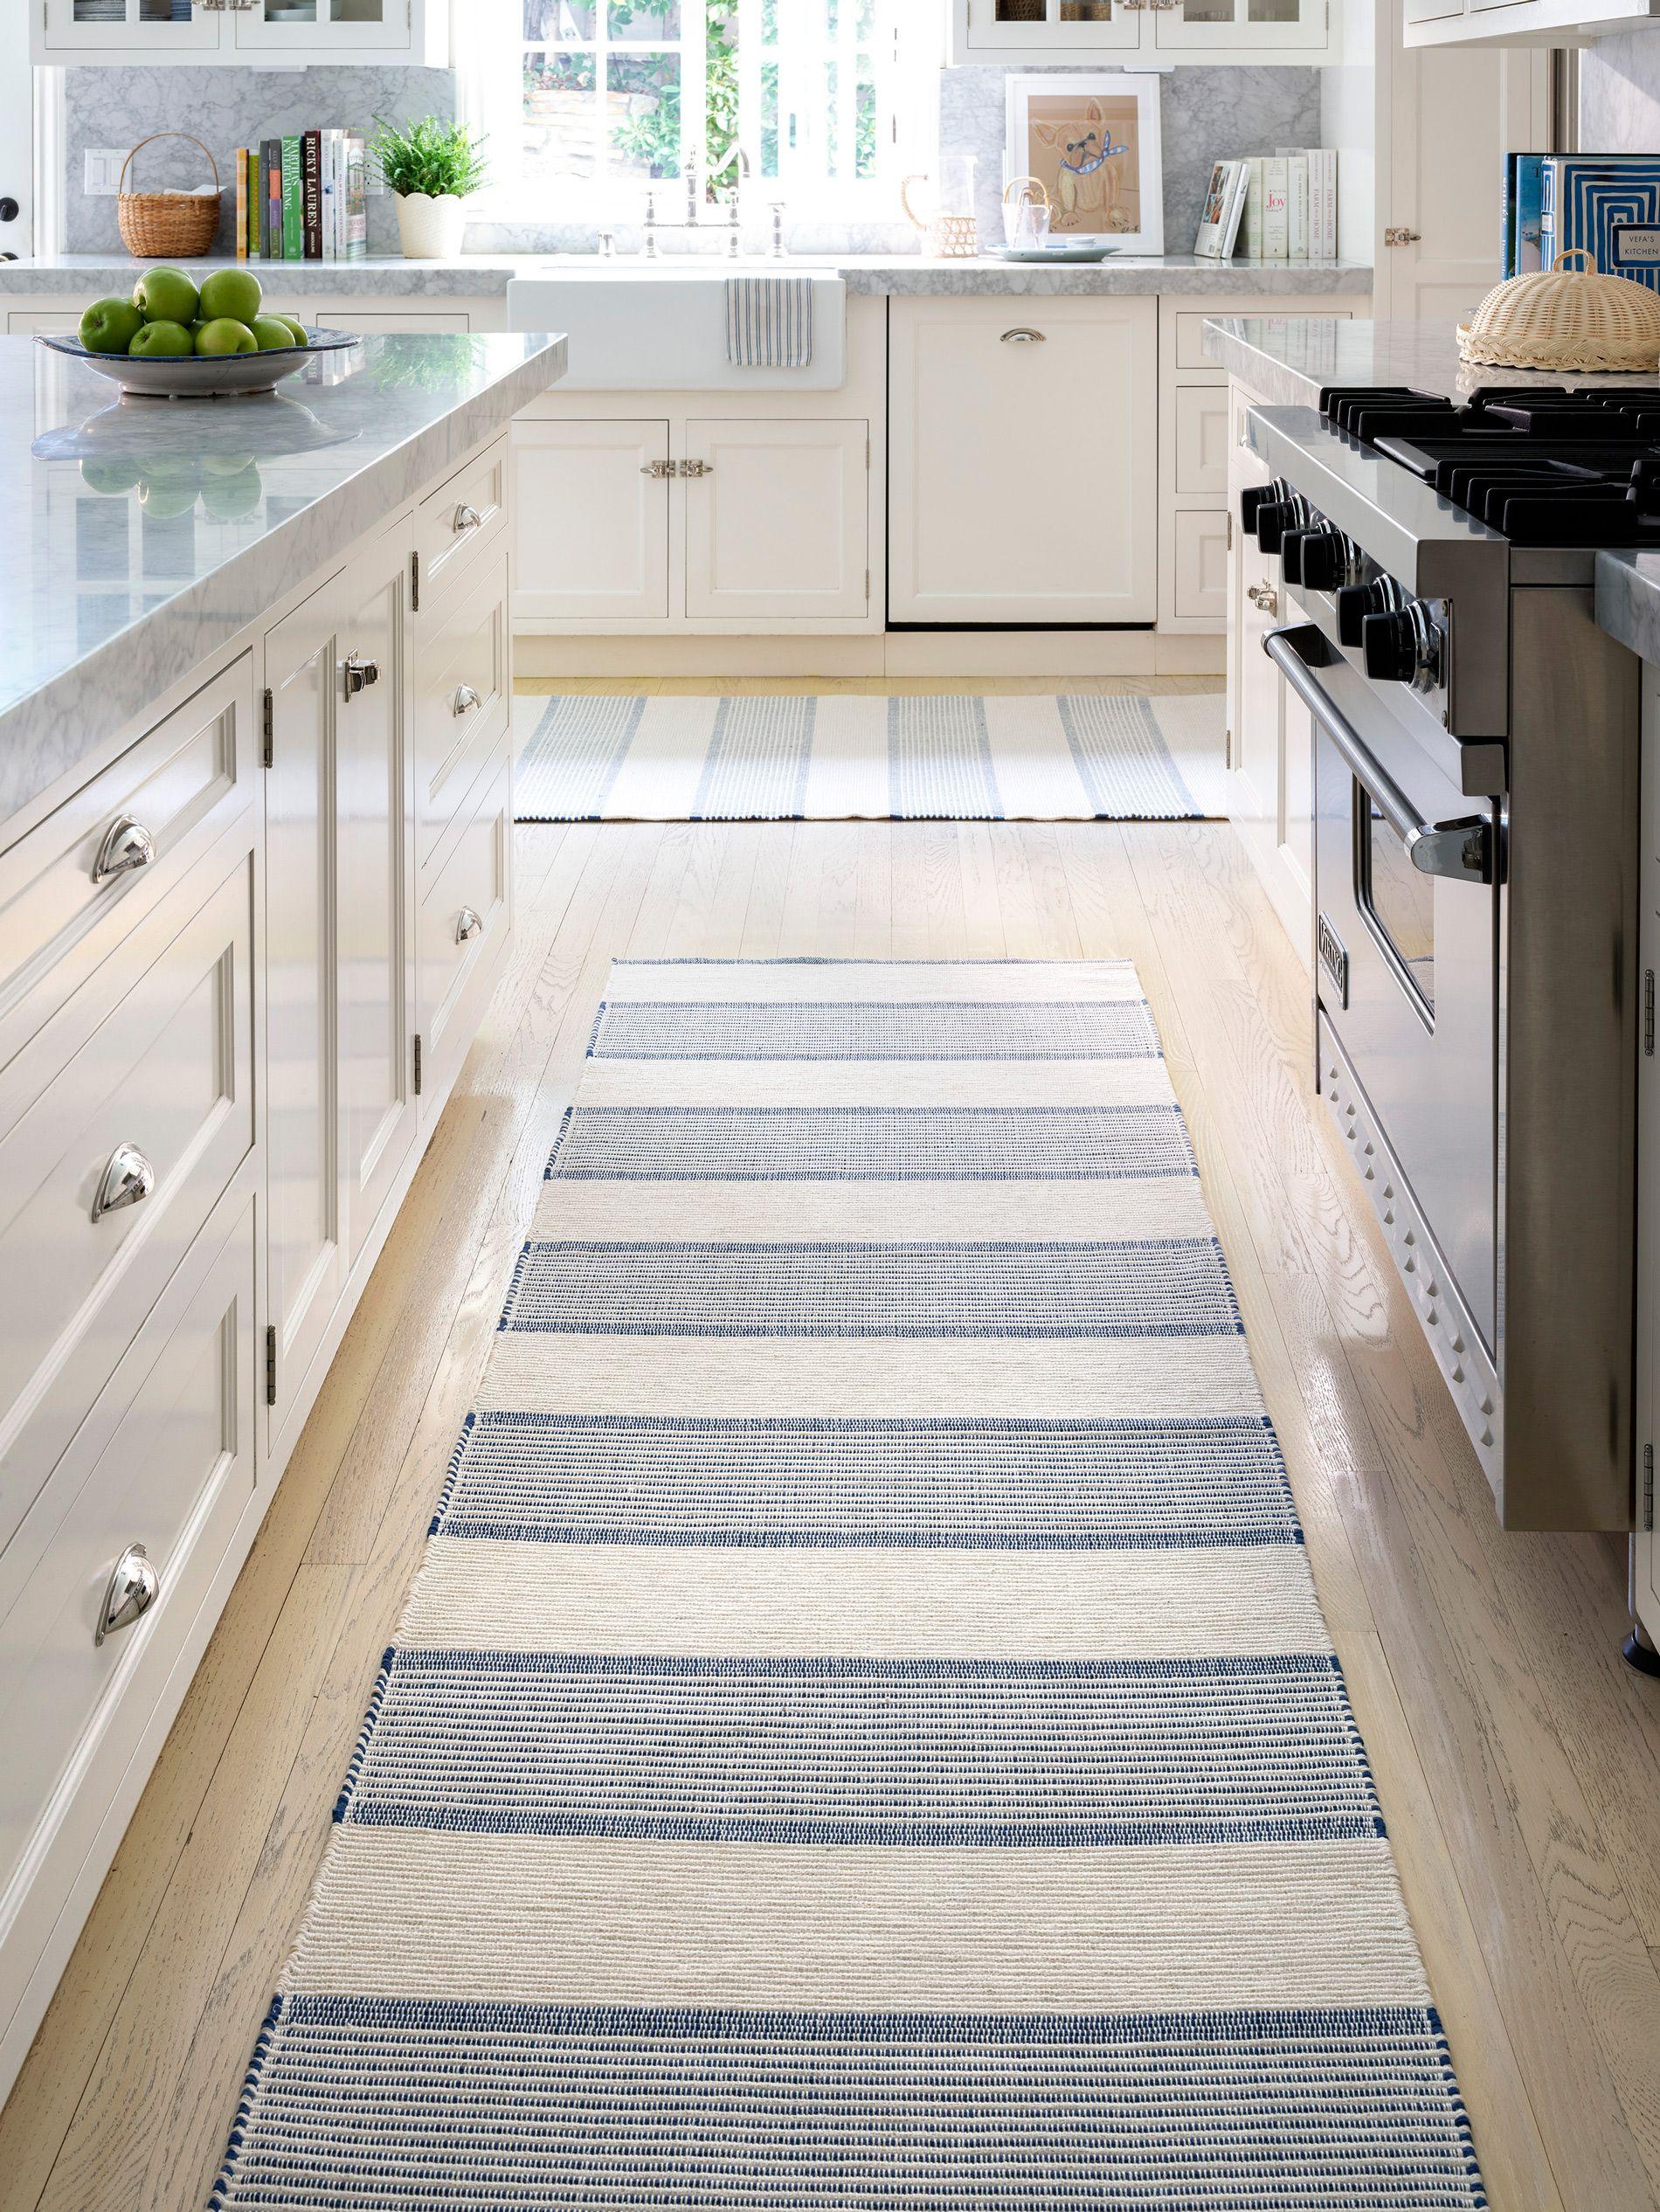 La Mirada Navy Woven Cotton Rug Dash Albert Kitchen Rug Rugs Rugs On Carpet